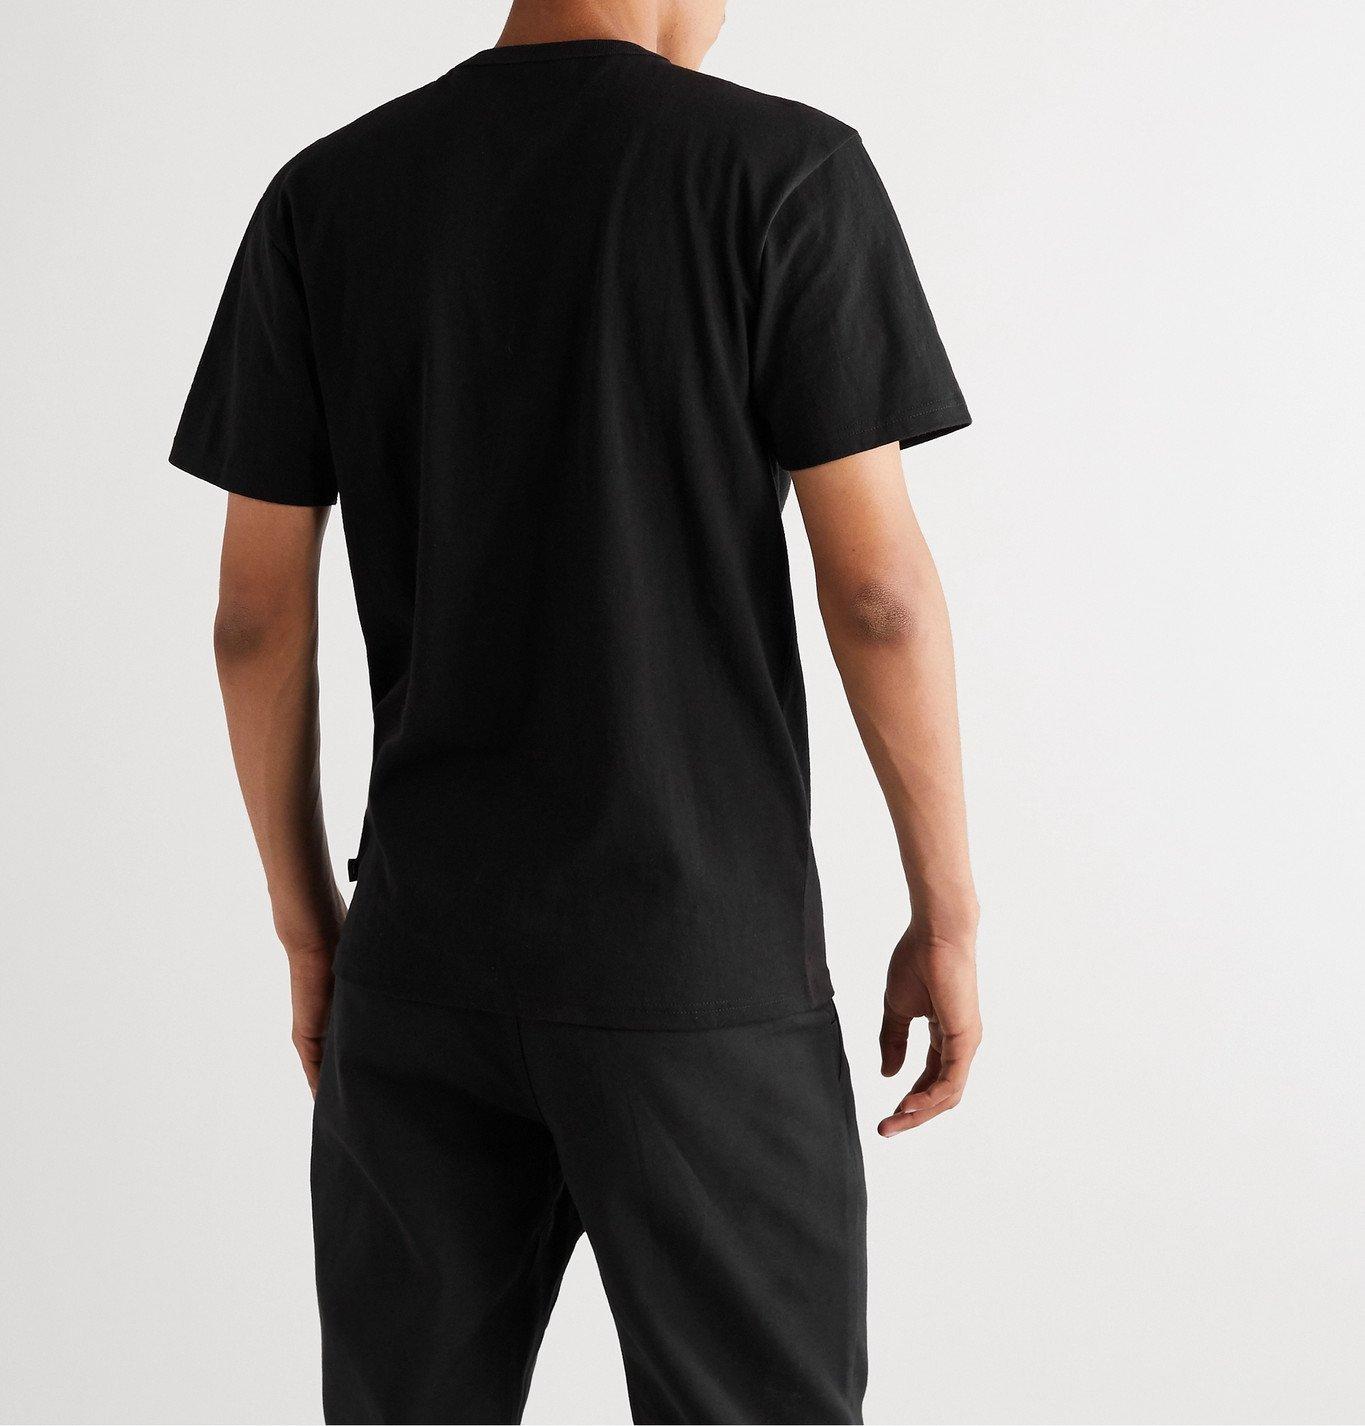 Vans - Vault Logo-Print Organic Cotton-Jersey T-Shirt - Black